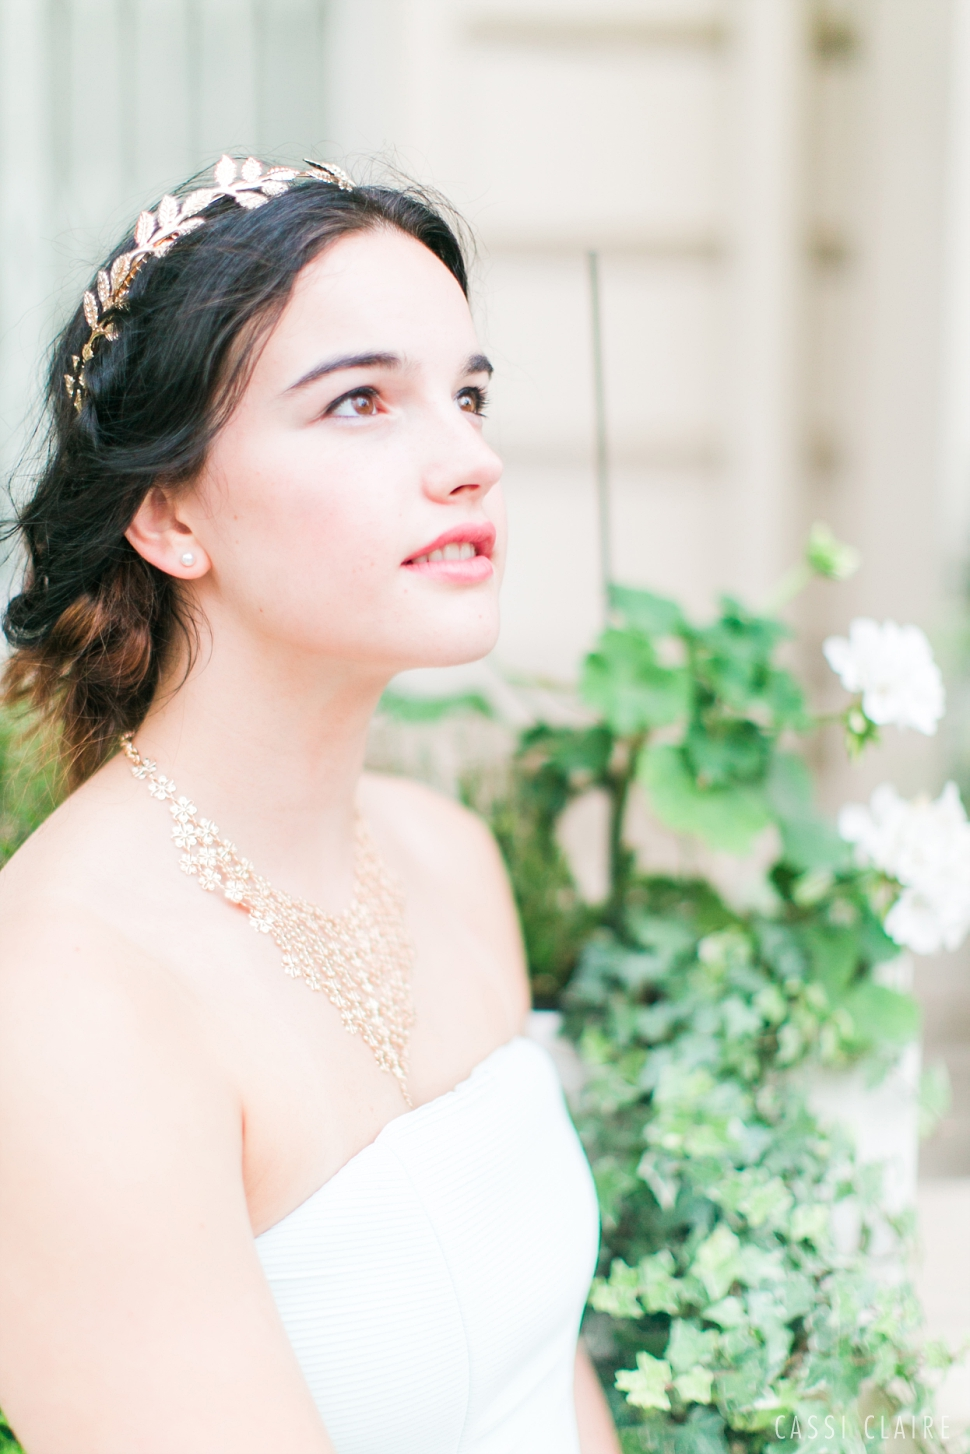 London-Wedding-Photographer-Hyde-Park_CassiClaire_11.jpg